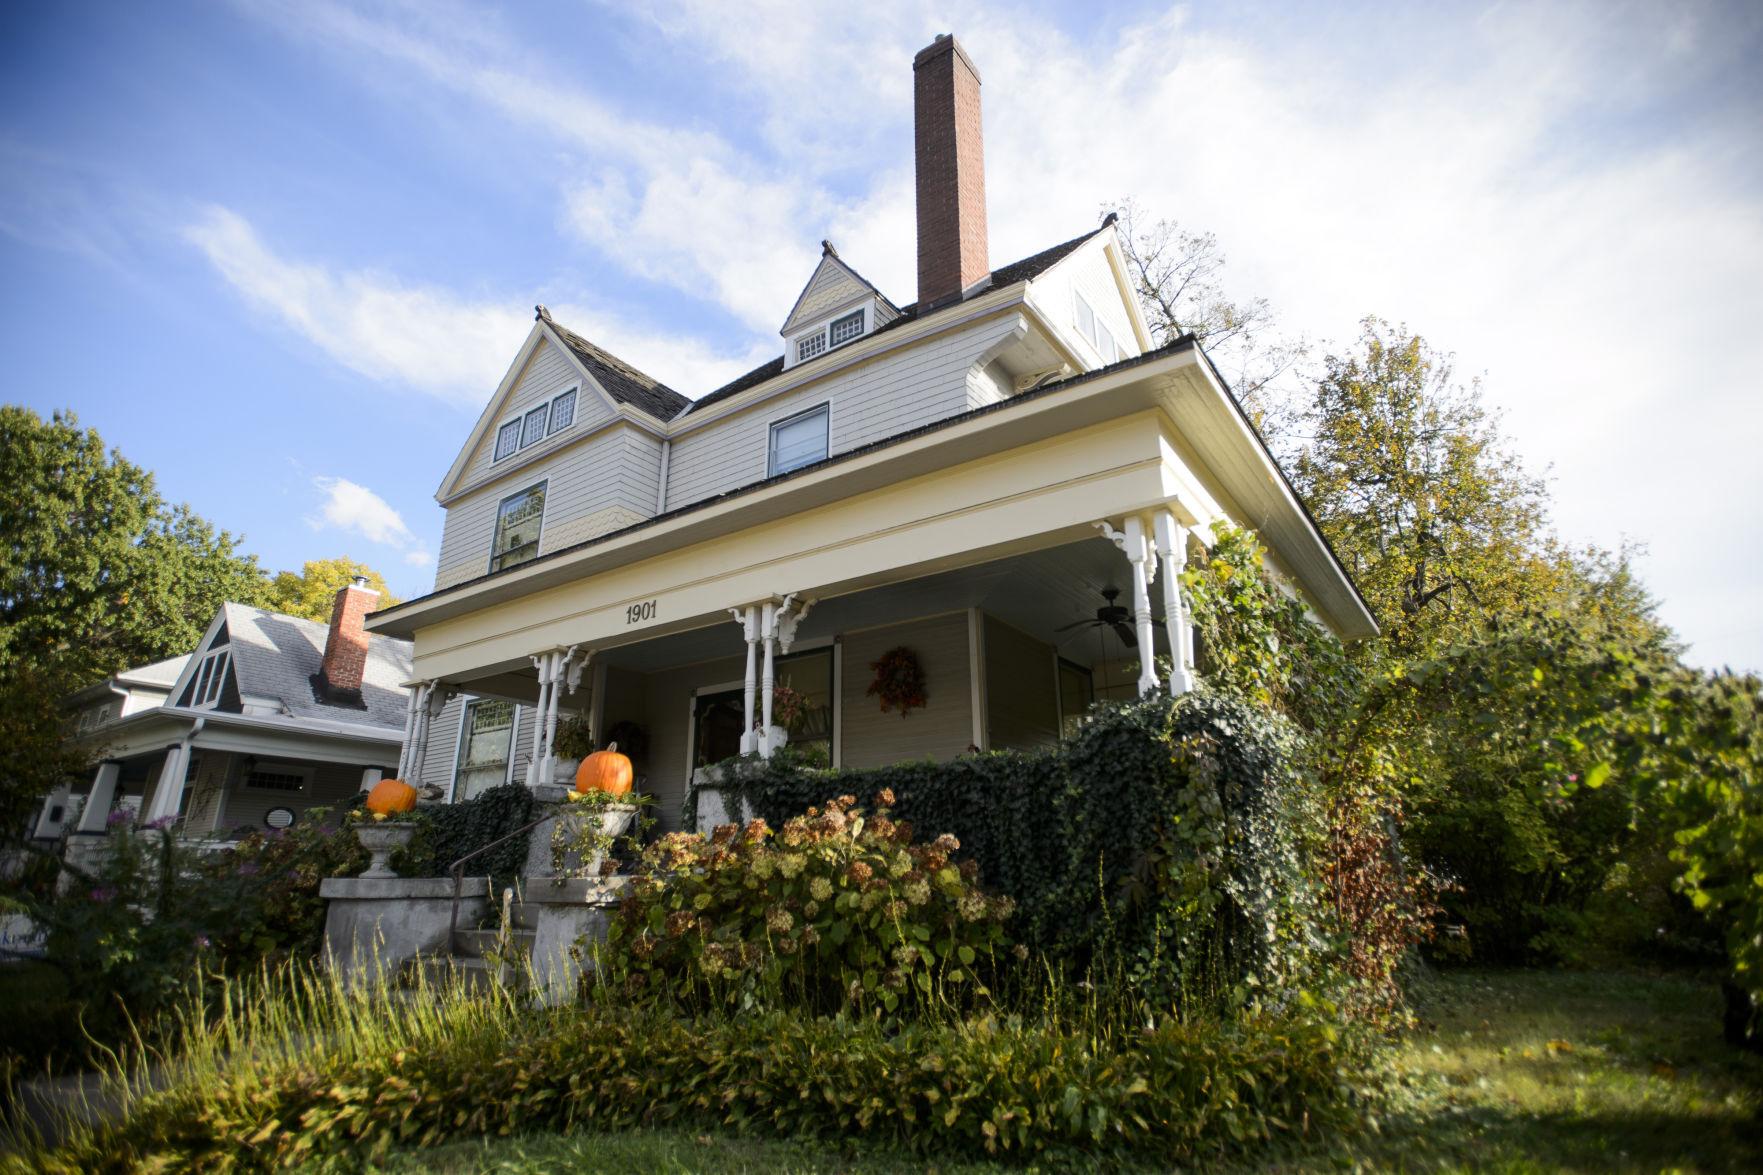 chimney swifts haunt already eerie home ahead of halloween state rh columbustelegram com